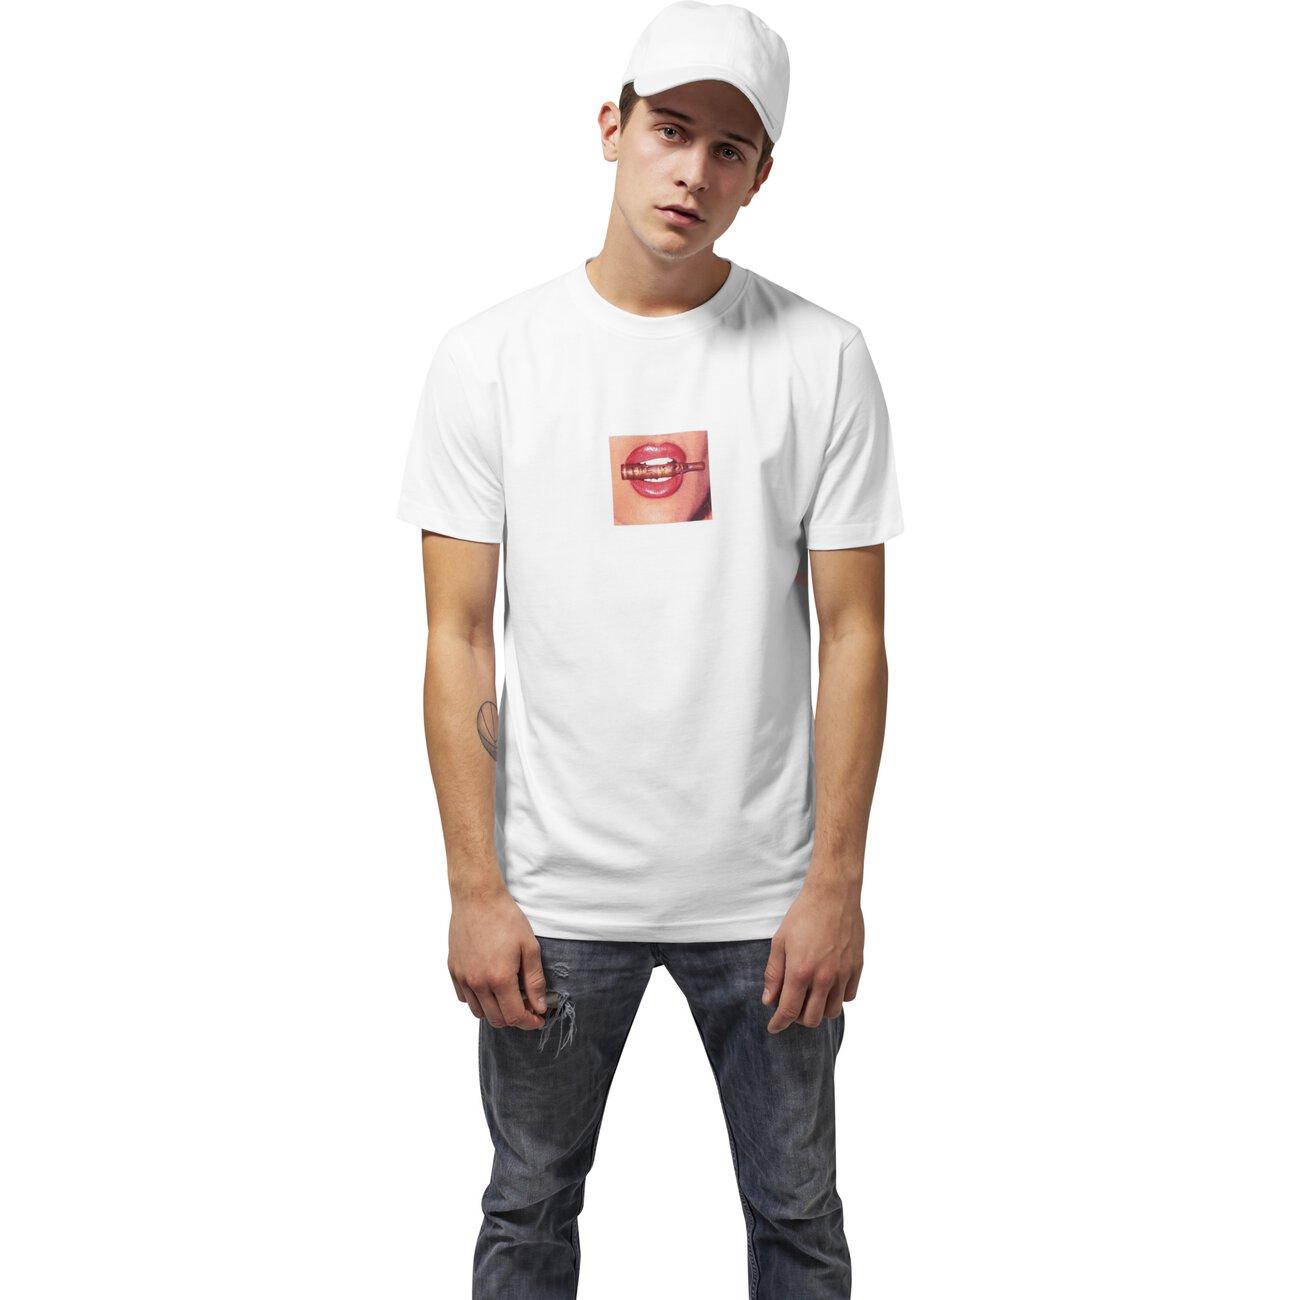 mister tee t shirt herren life is pain print shirt mt 419 wei. Black Bedroom Furniture Sets. Home Design Ideas